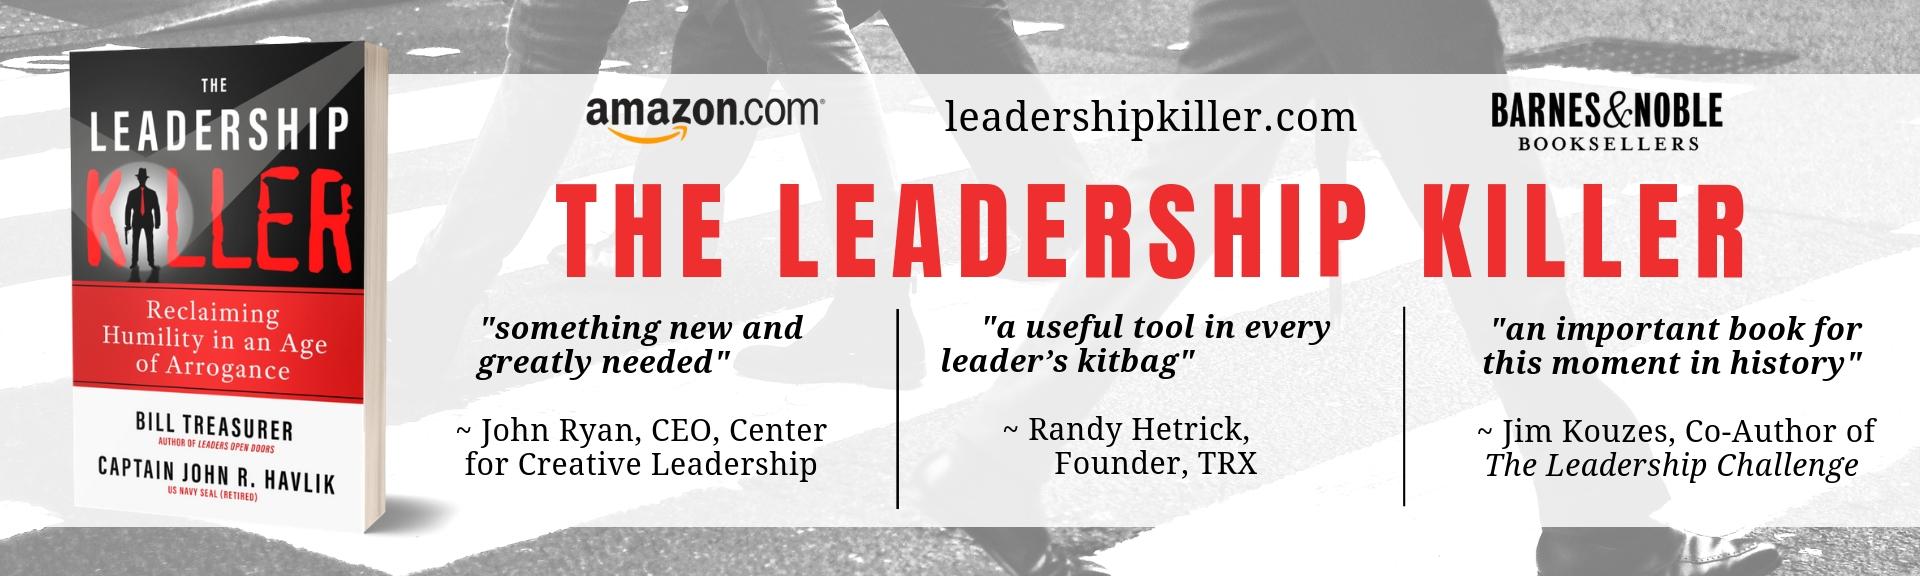 John Perkins - The Leadership Killer